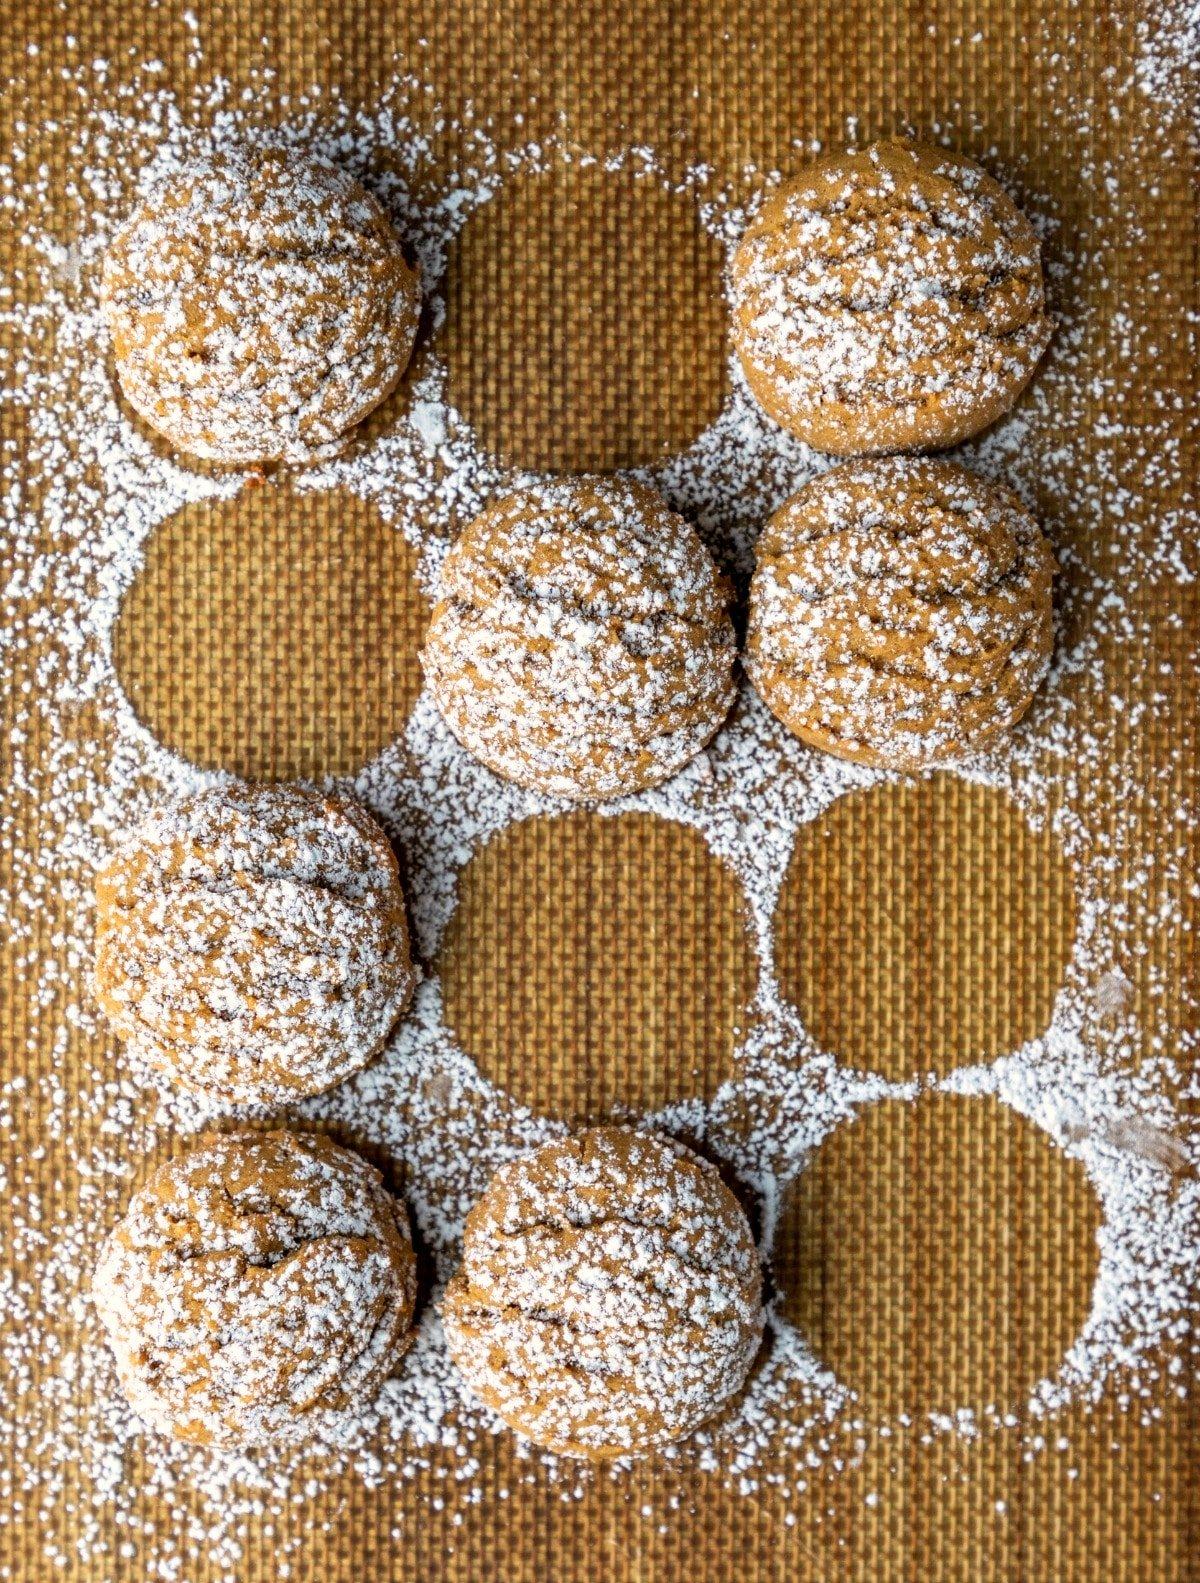 Pfeffernusse cookies sprinkled with powdered sugar on a baking mat